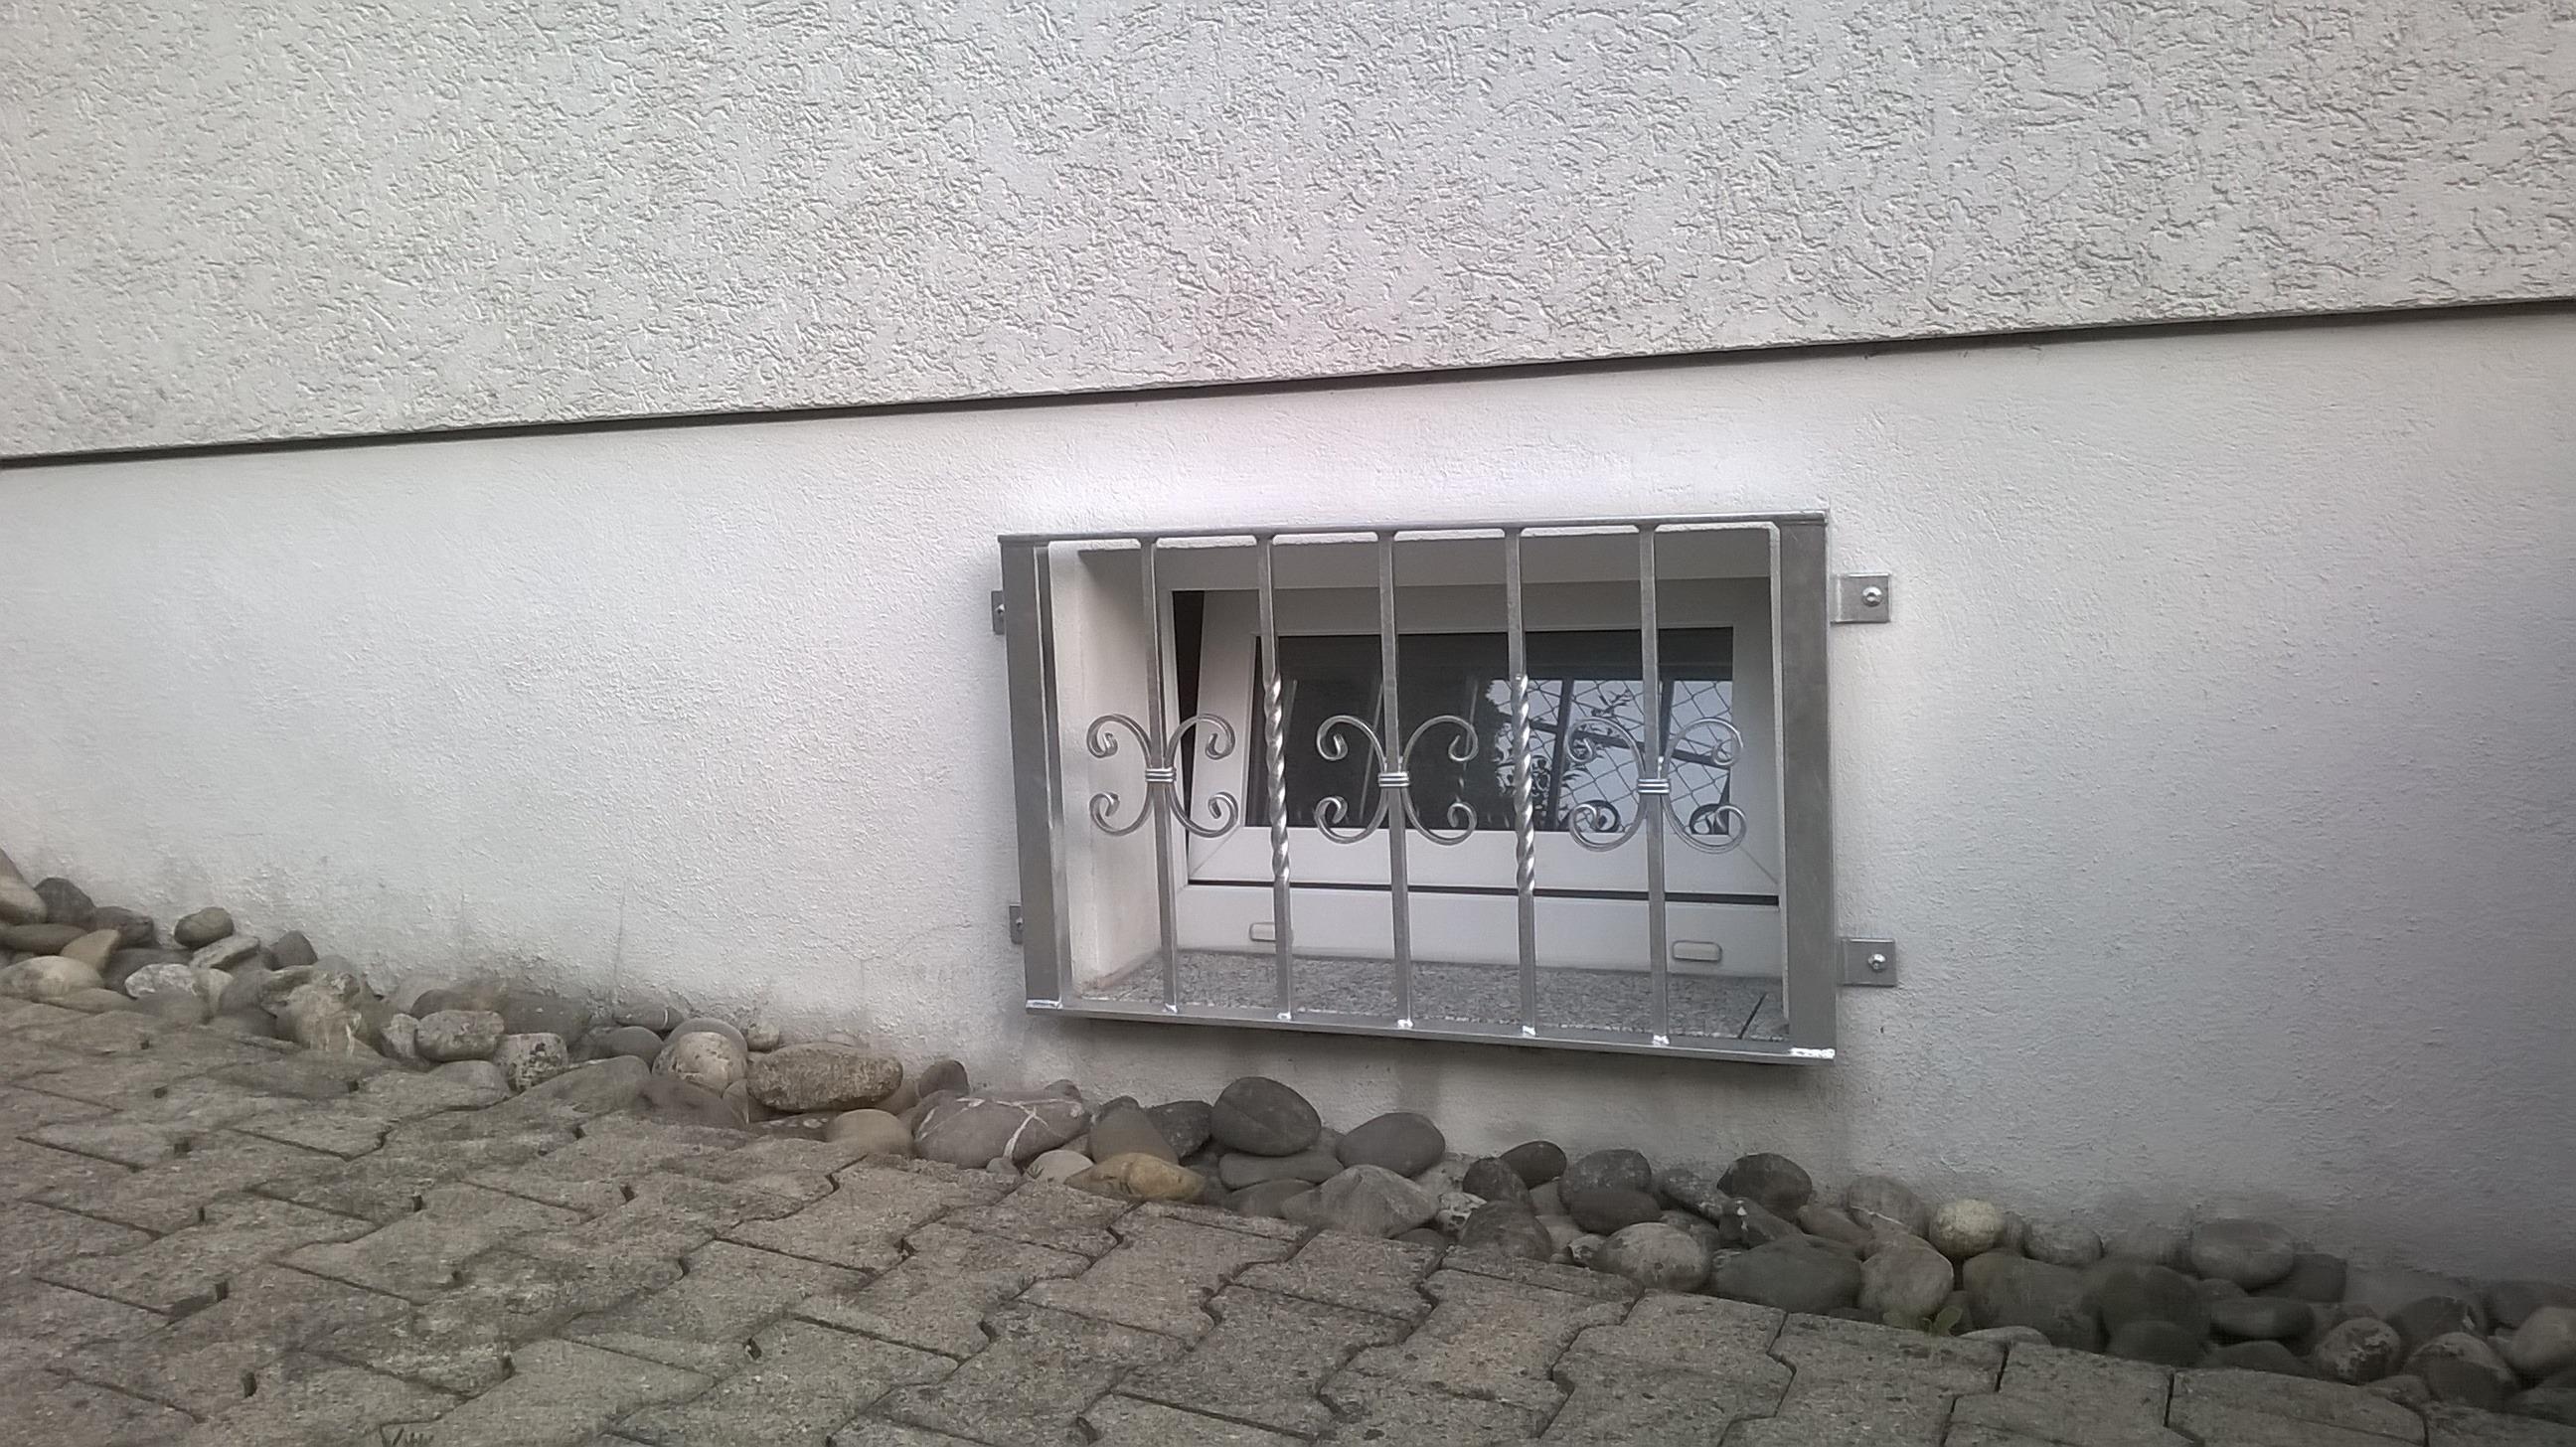 Kellerfenstergitter Barock verzinkte Oberfläche